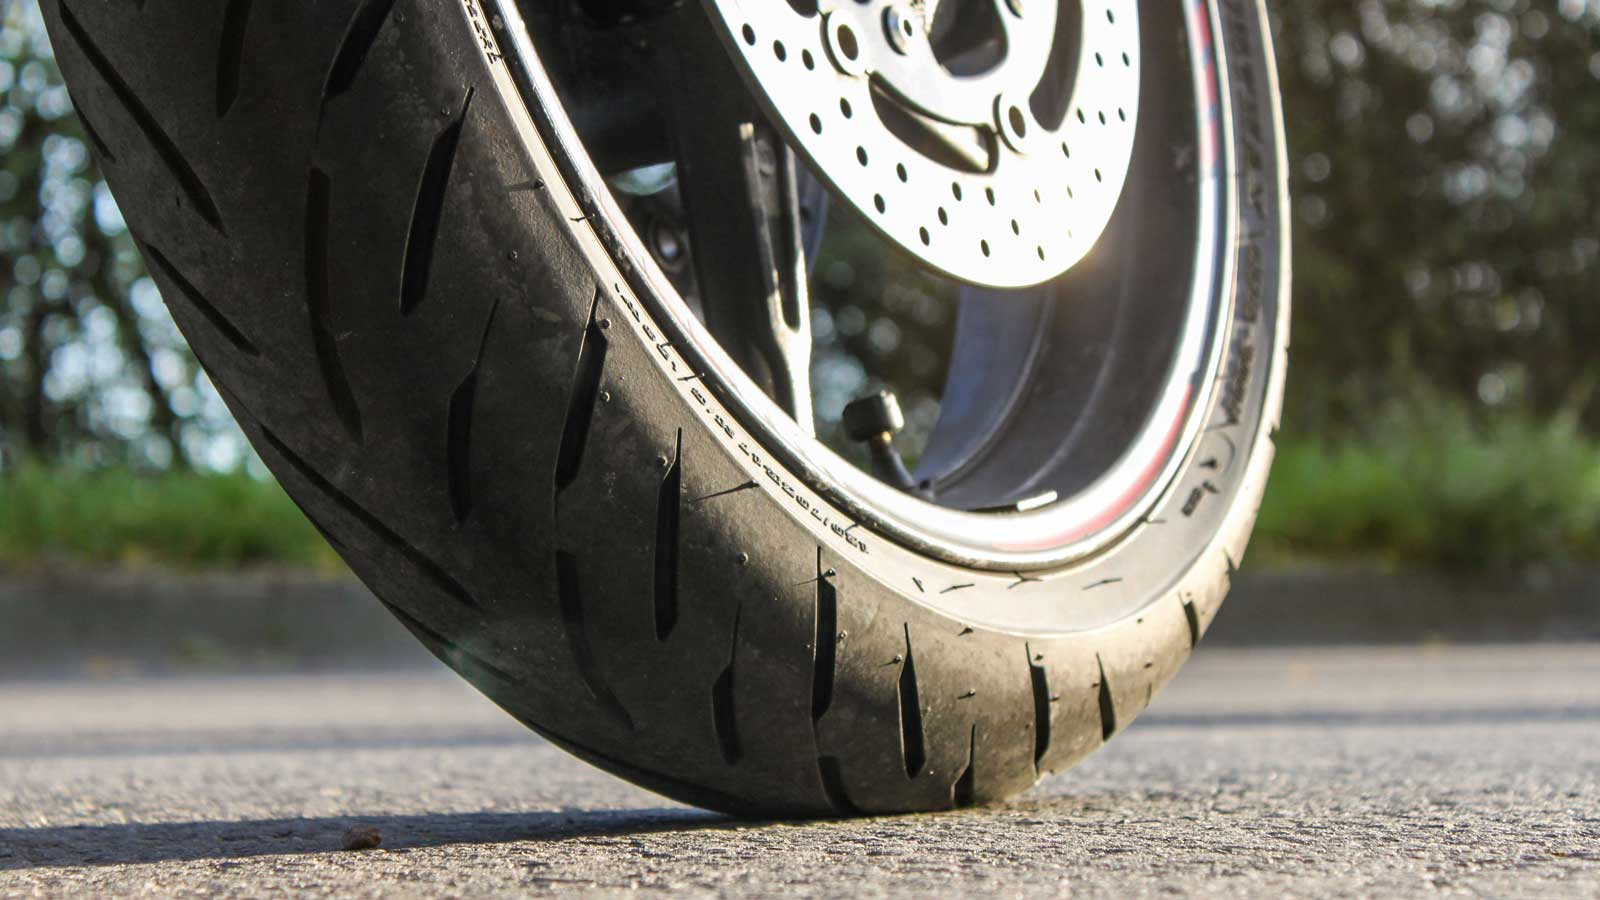 Dunlop Sportmax GPR-300 Erfahrungsbericht Teaserbild